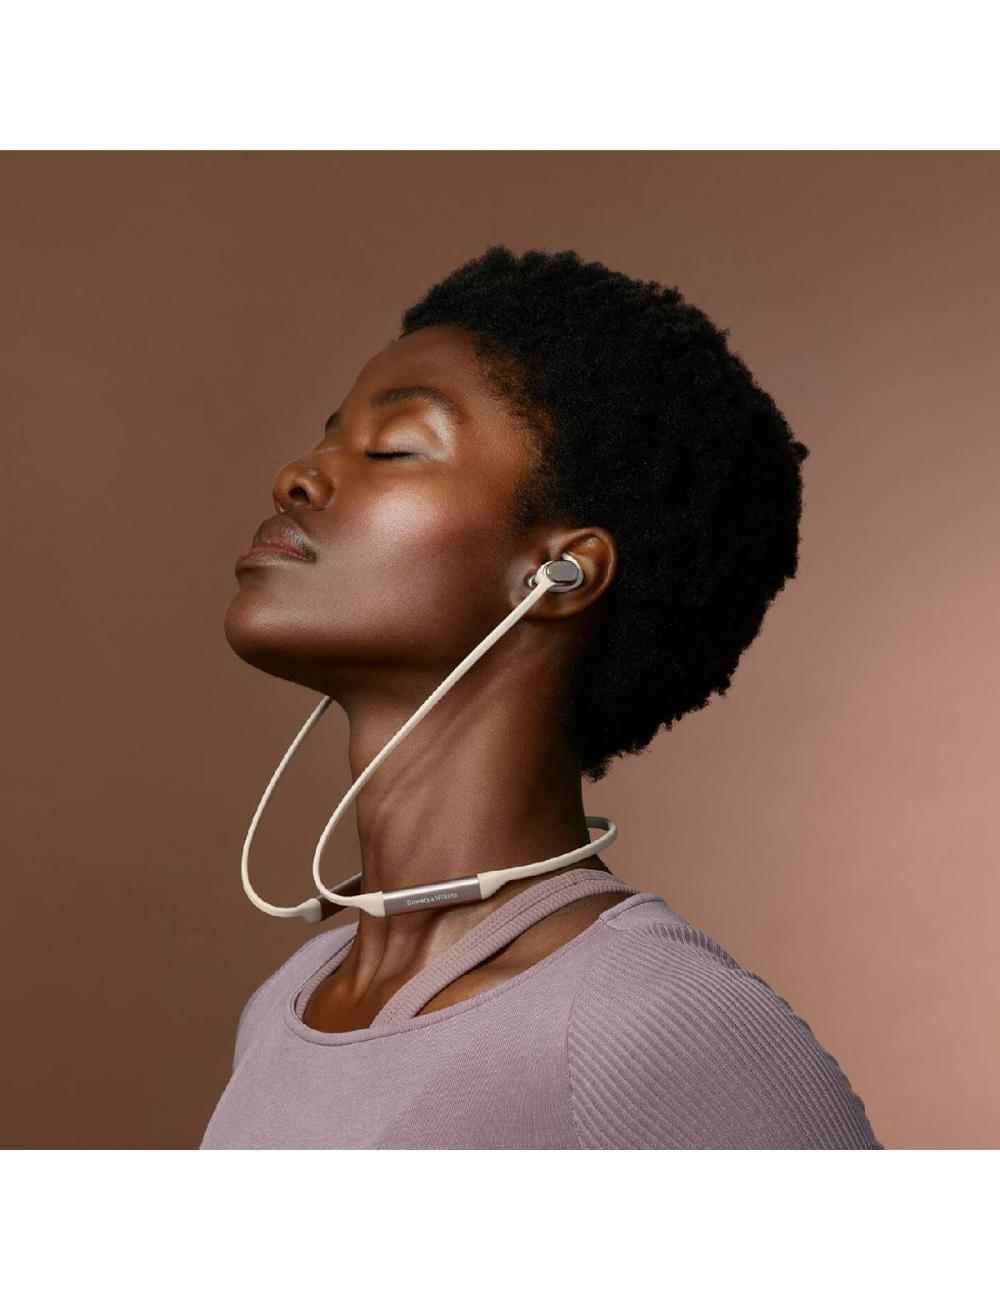 cuffie wireless senza fili Bluetooth, Bowers & Wilkins PI3, indossate donna